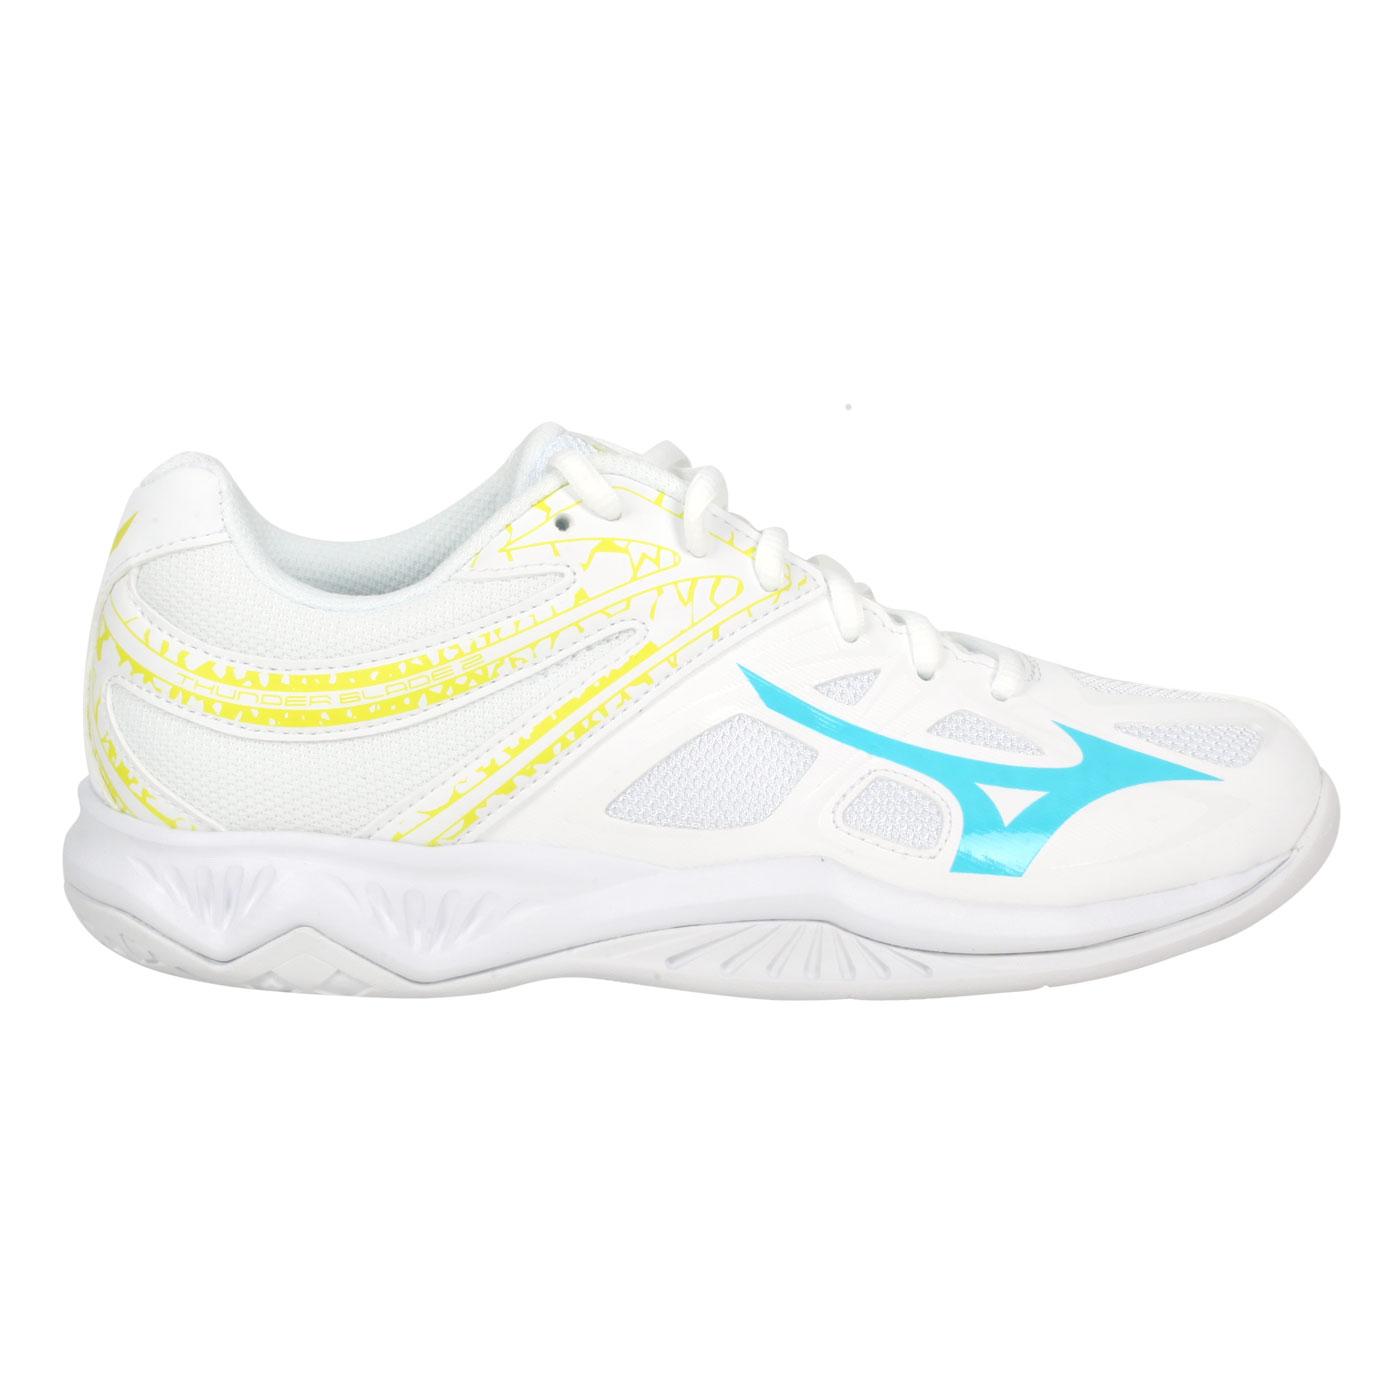 MIZUNO 女款排球鞋  @THUNDER BLADE 2@V1GA197022